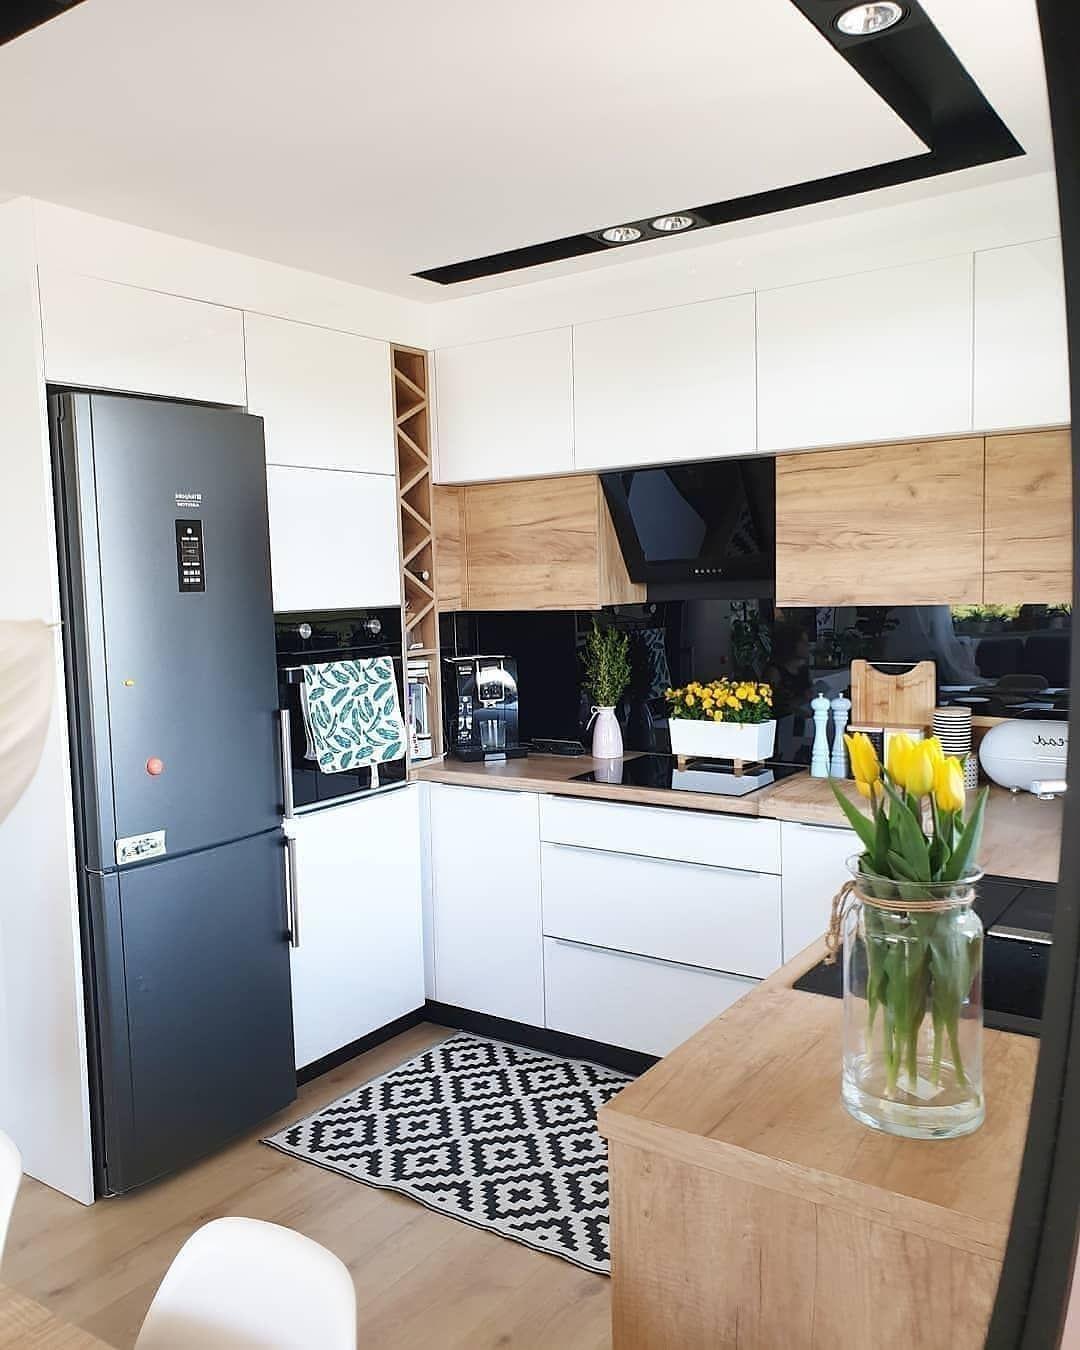 Idee Per La Cucina pin di locatelli federica su casina idee..❤️ nel 2020